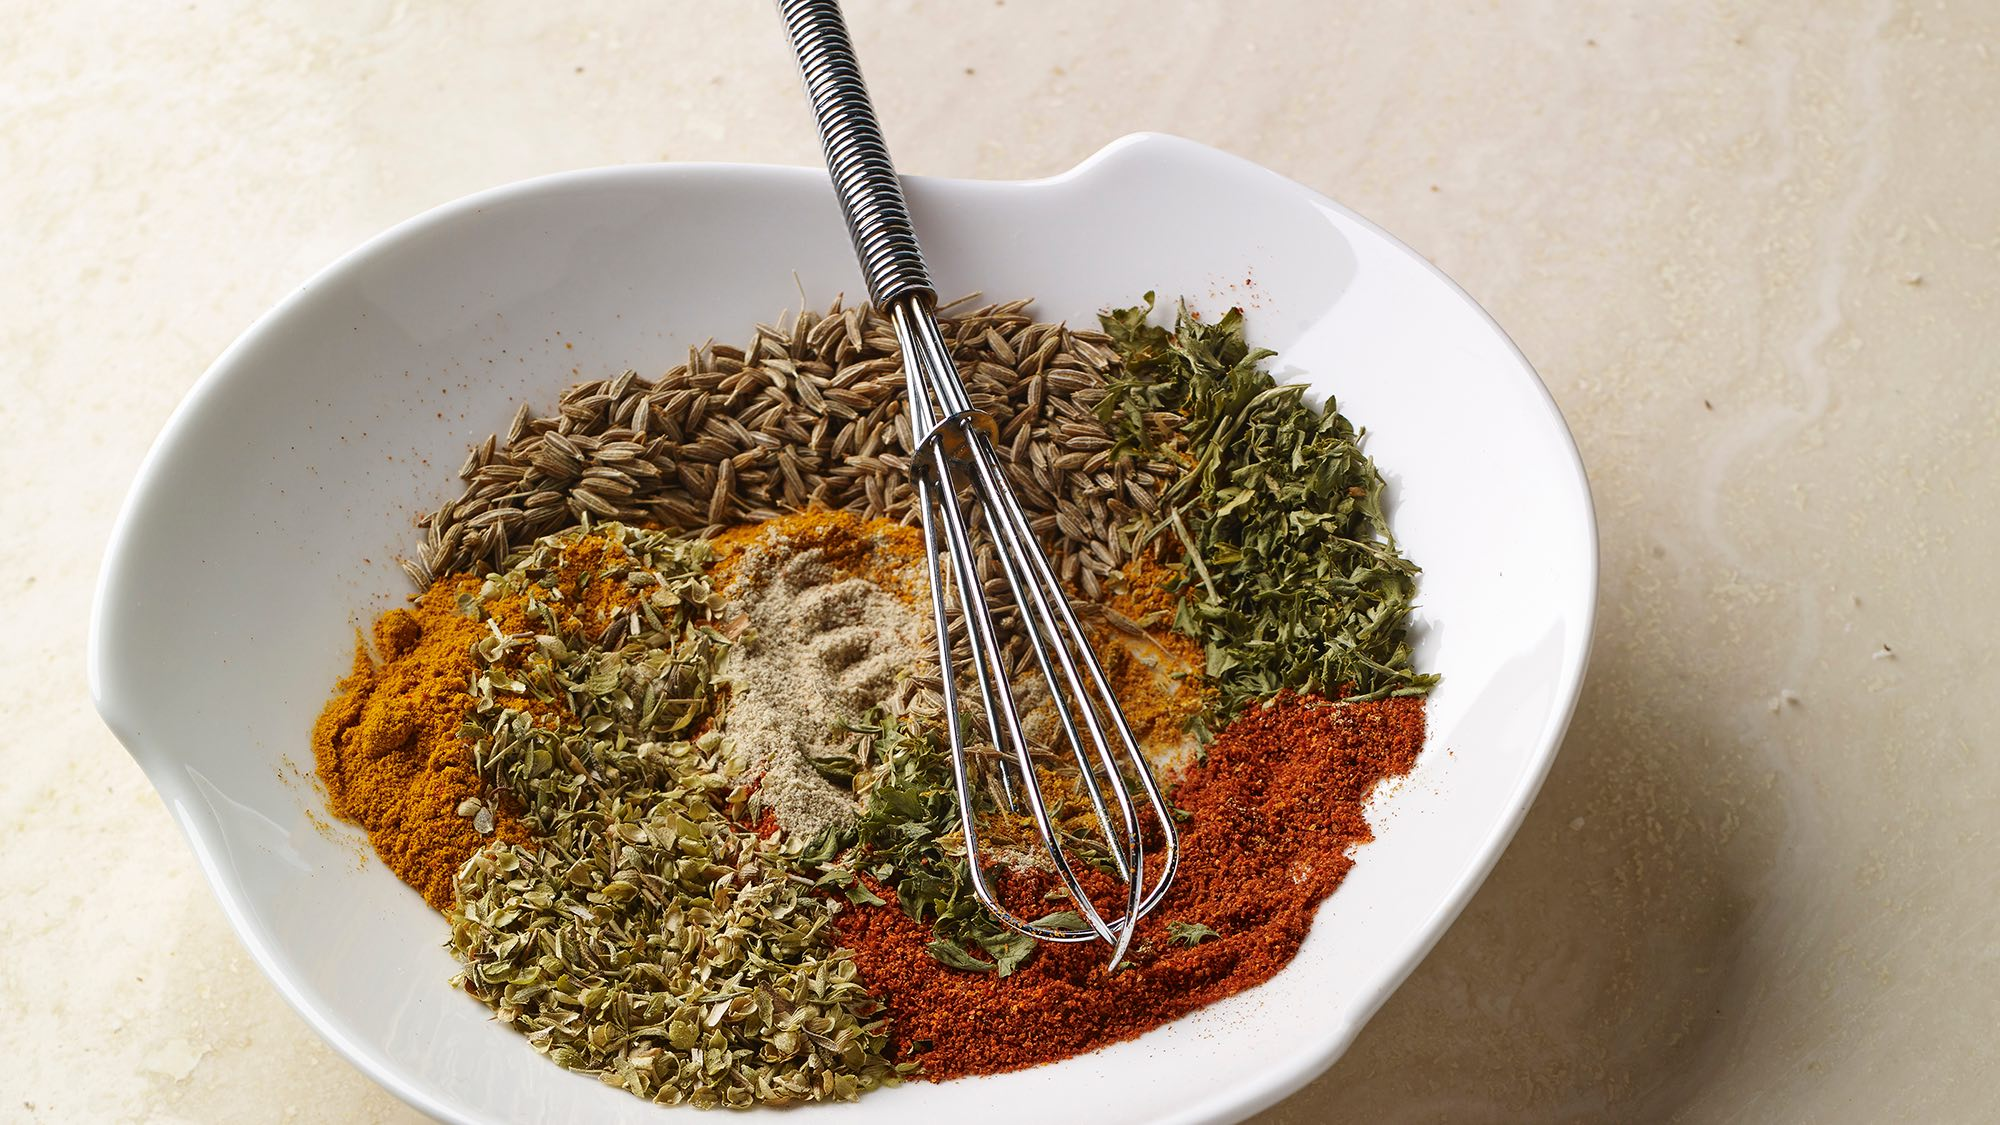 bahian-seasoning-blend.jpg